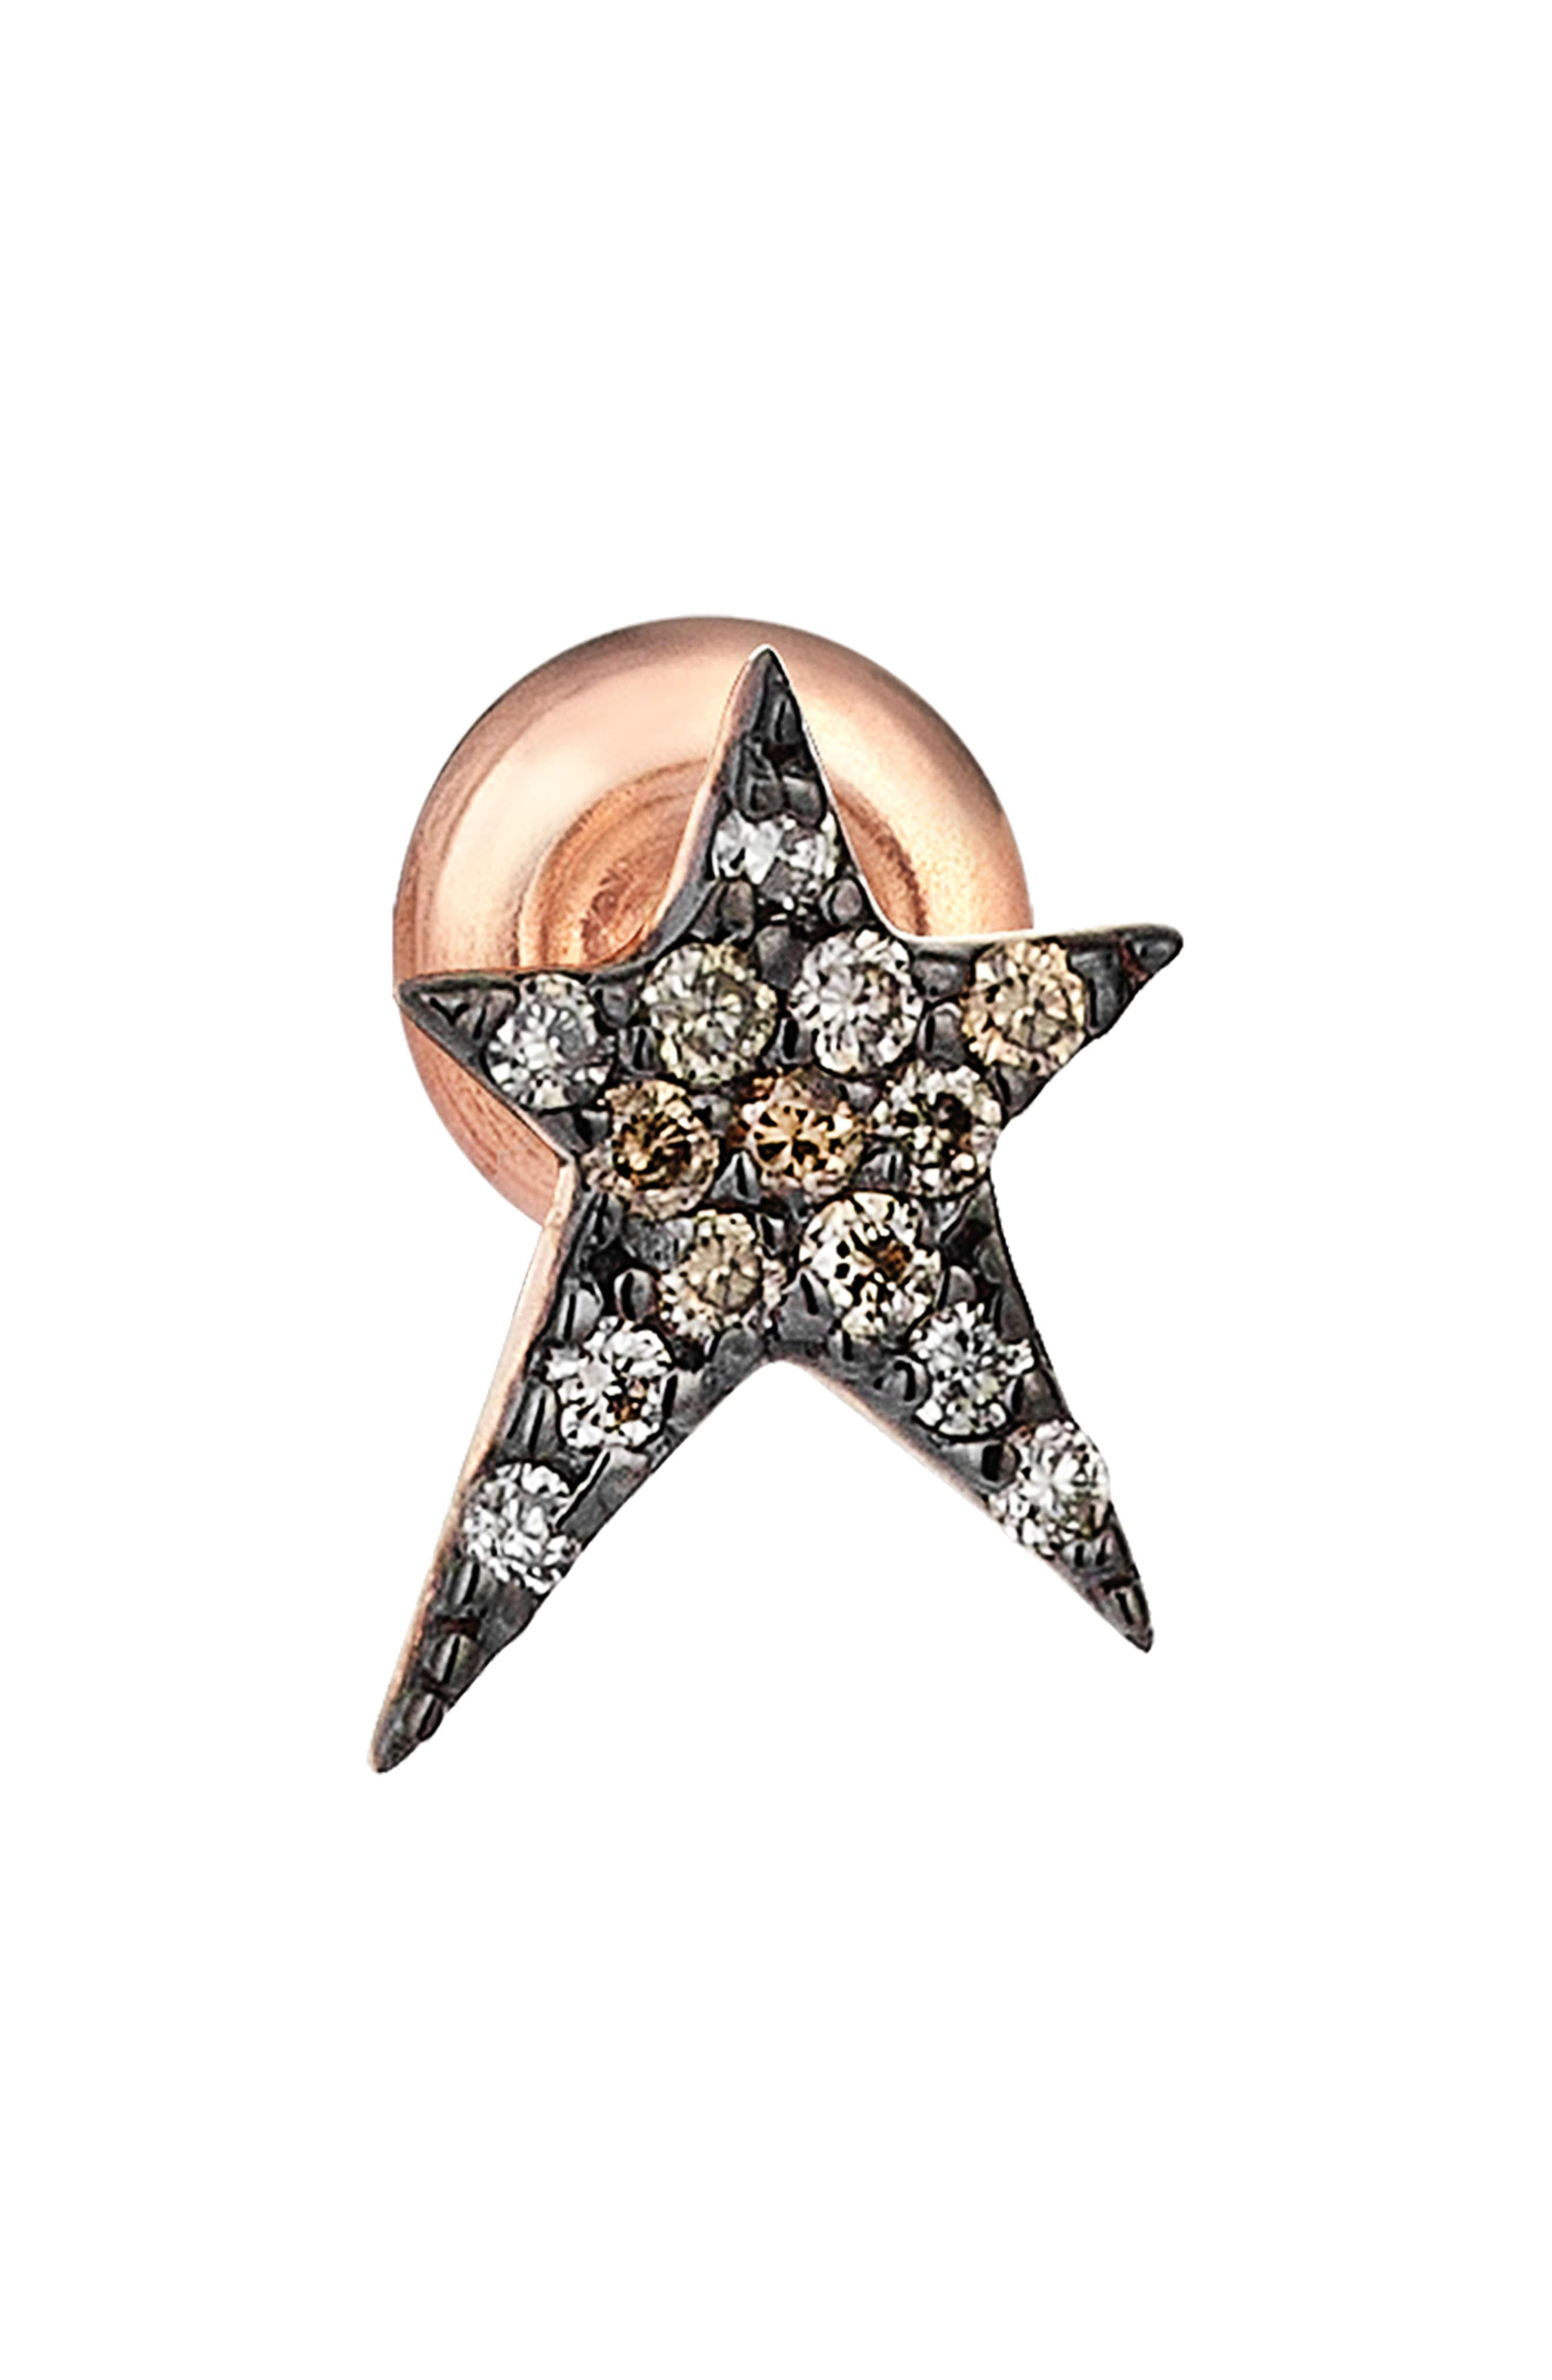 Diamond Stud Earrings,                             Main thumbnail 1, color,                             Rose Gold